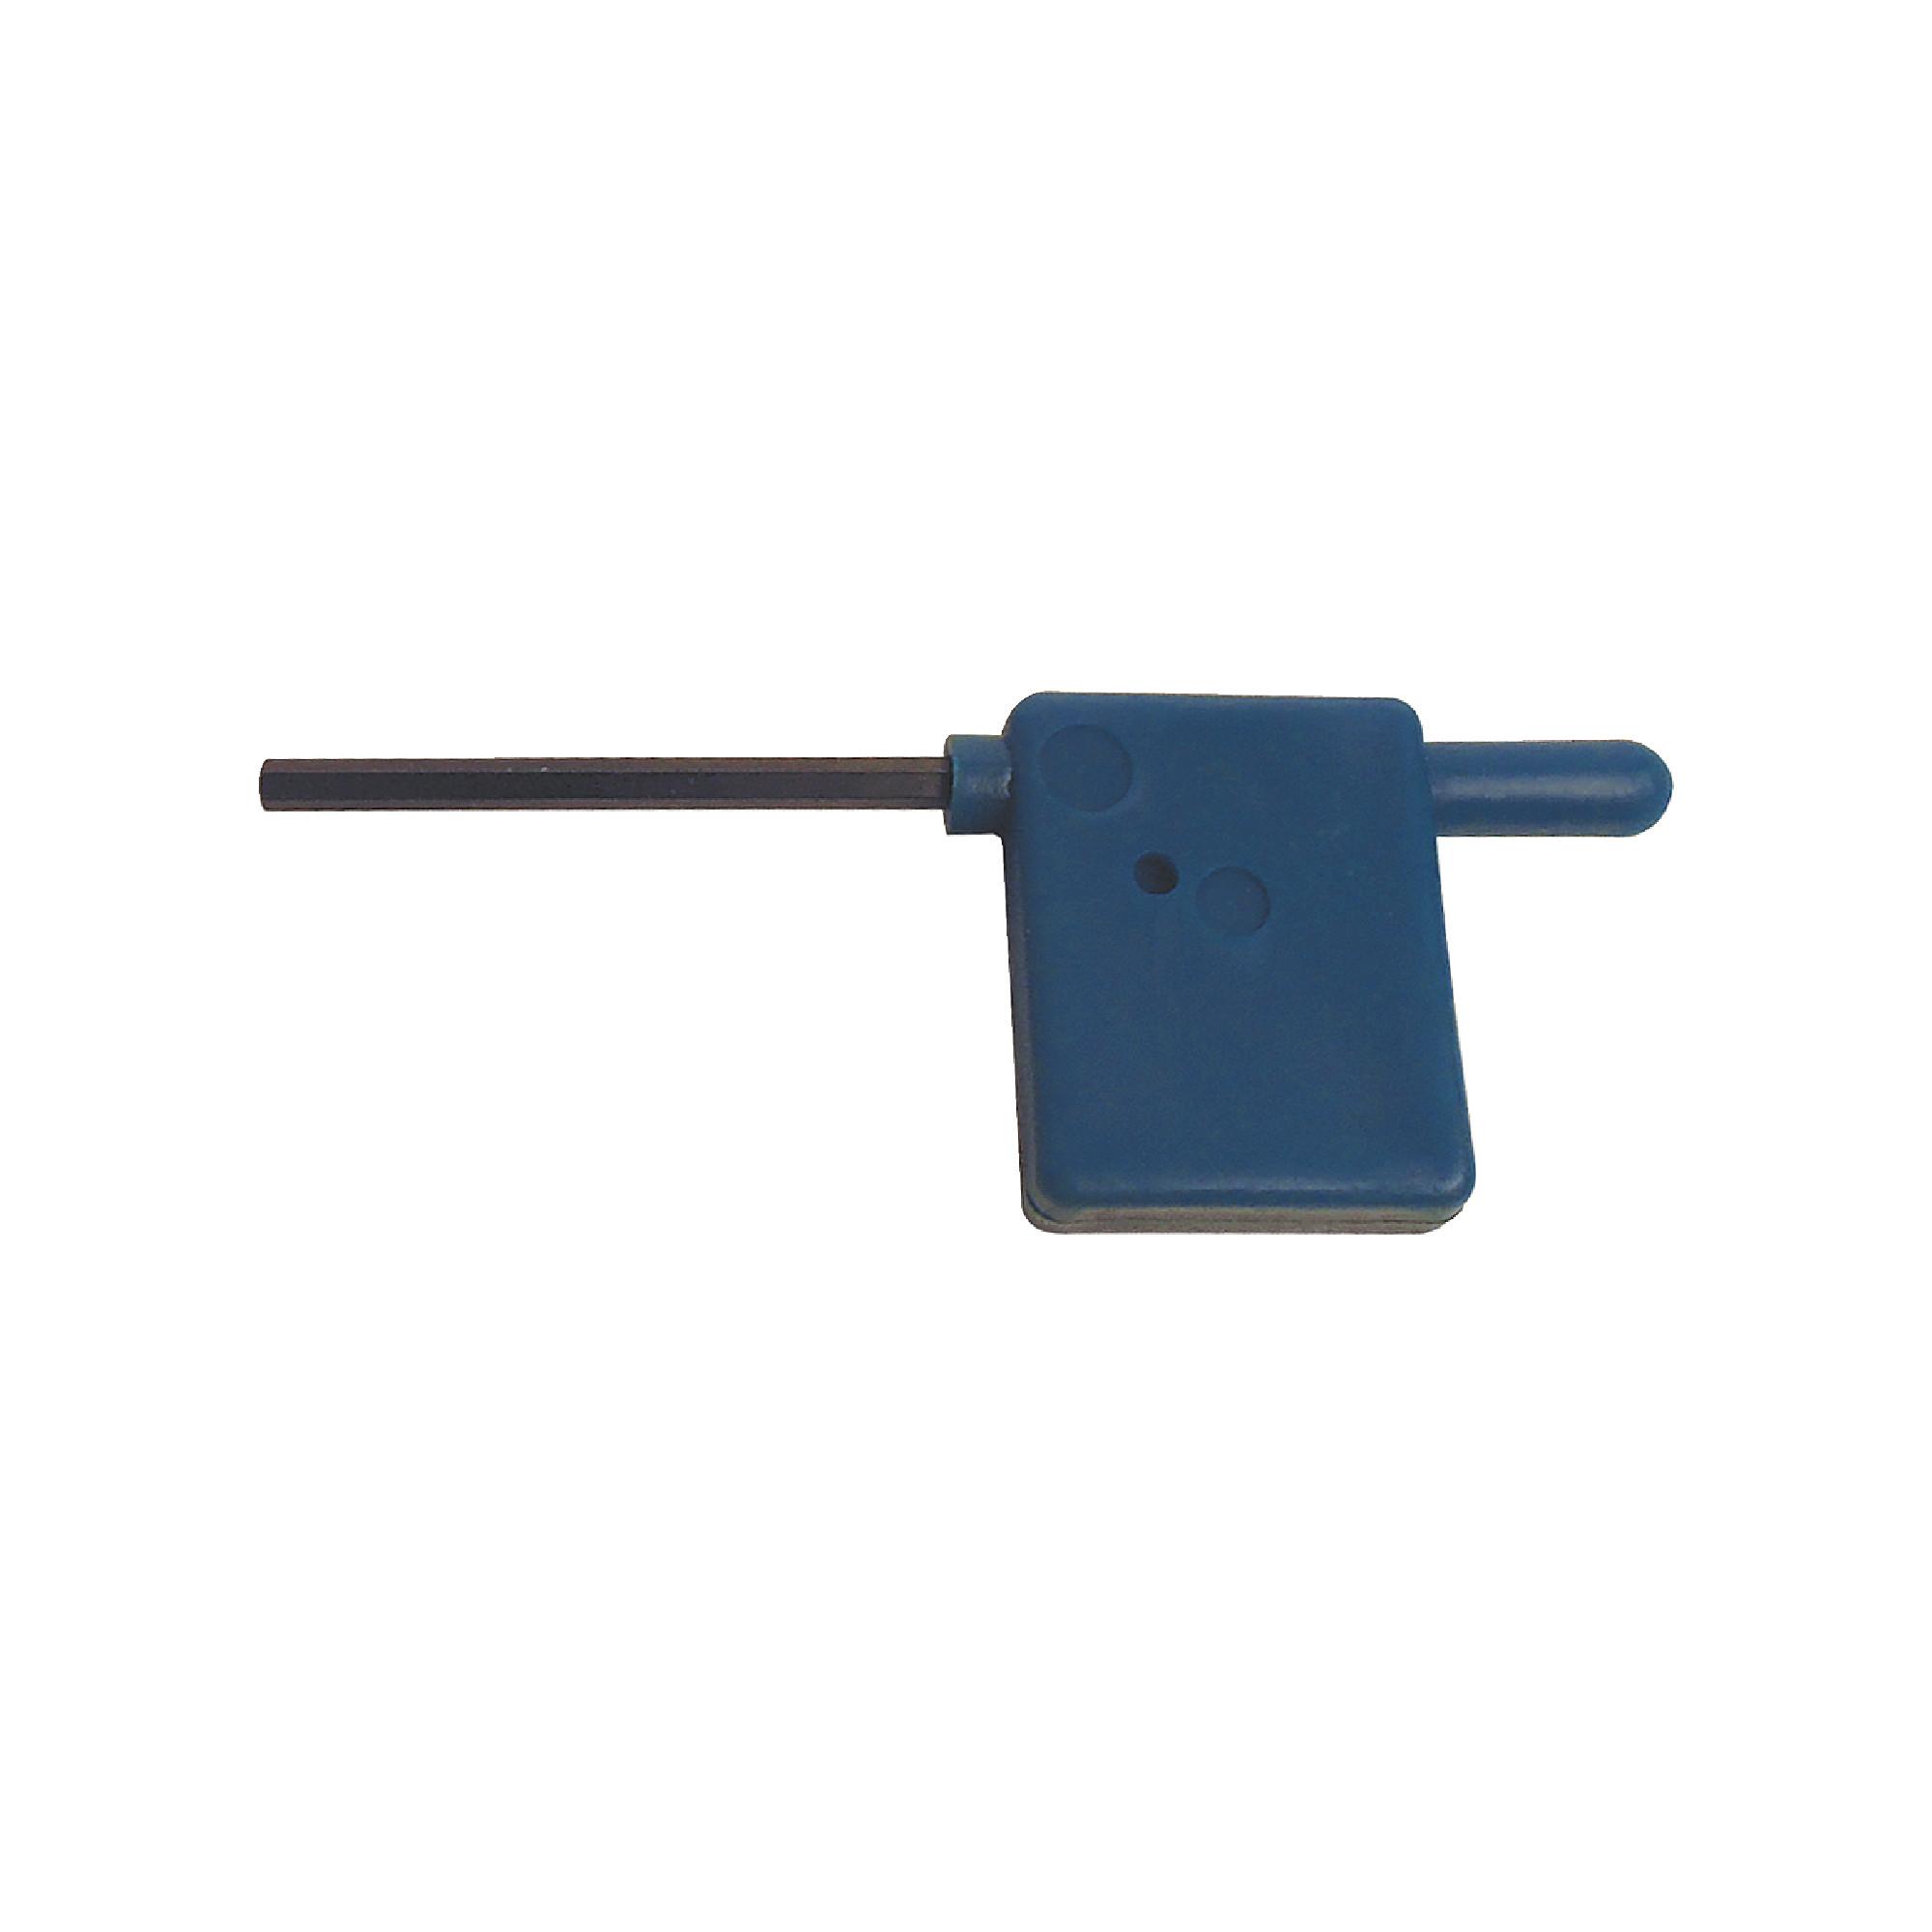 HW 2.5/5 Hex Key for MWLNR/L Toolholder